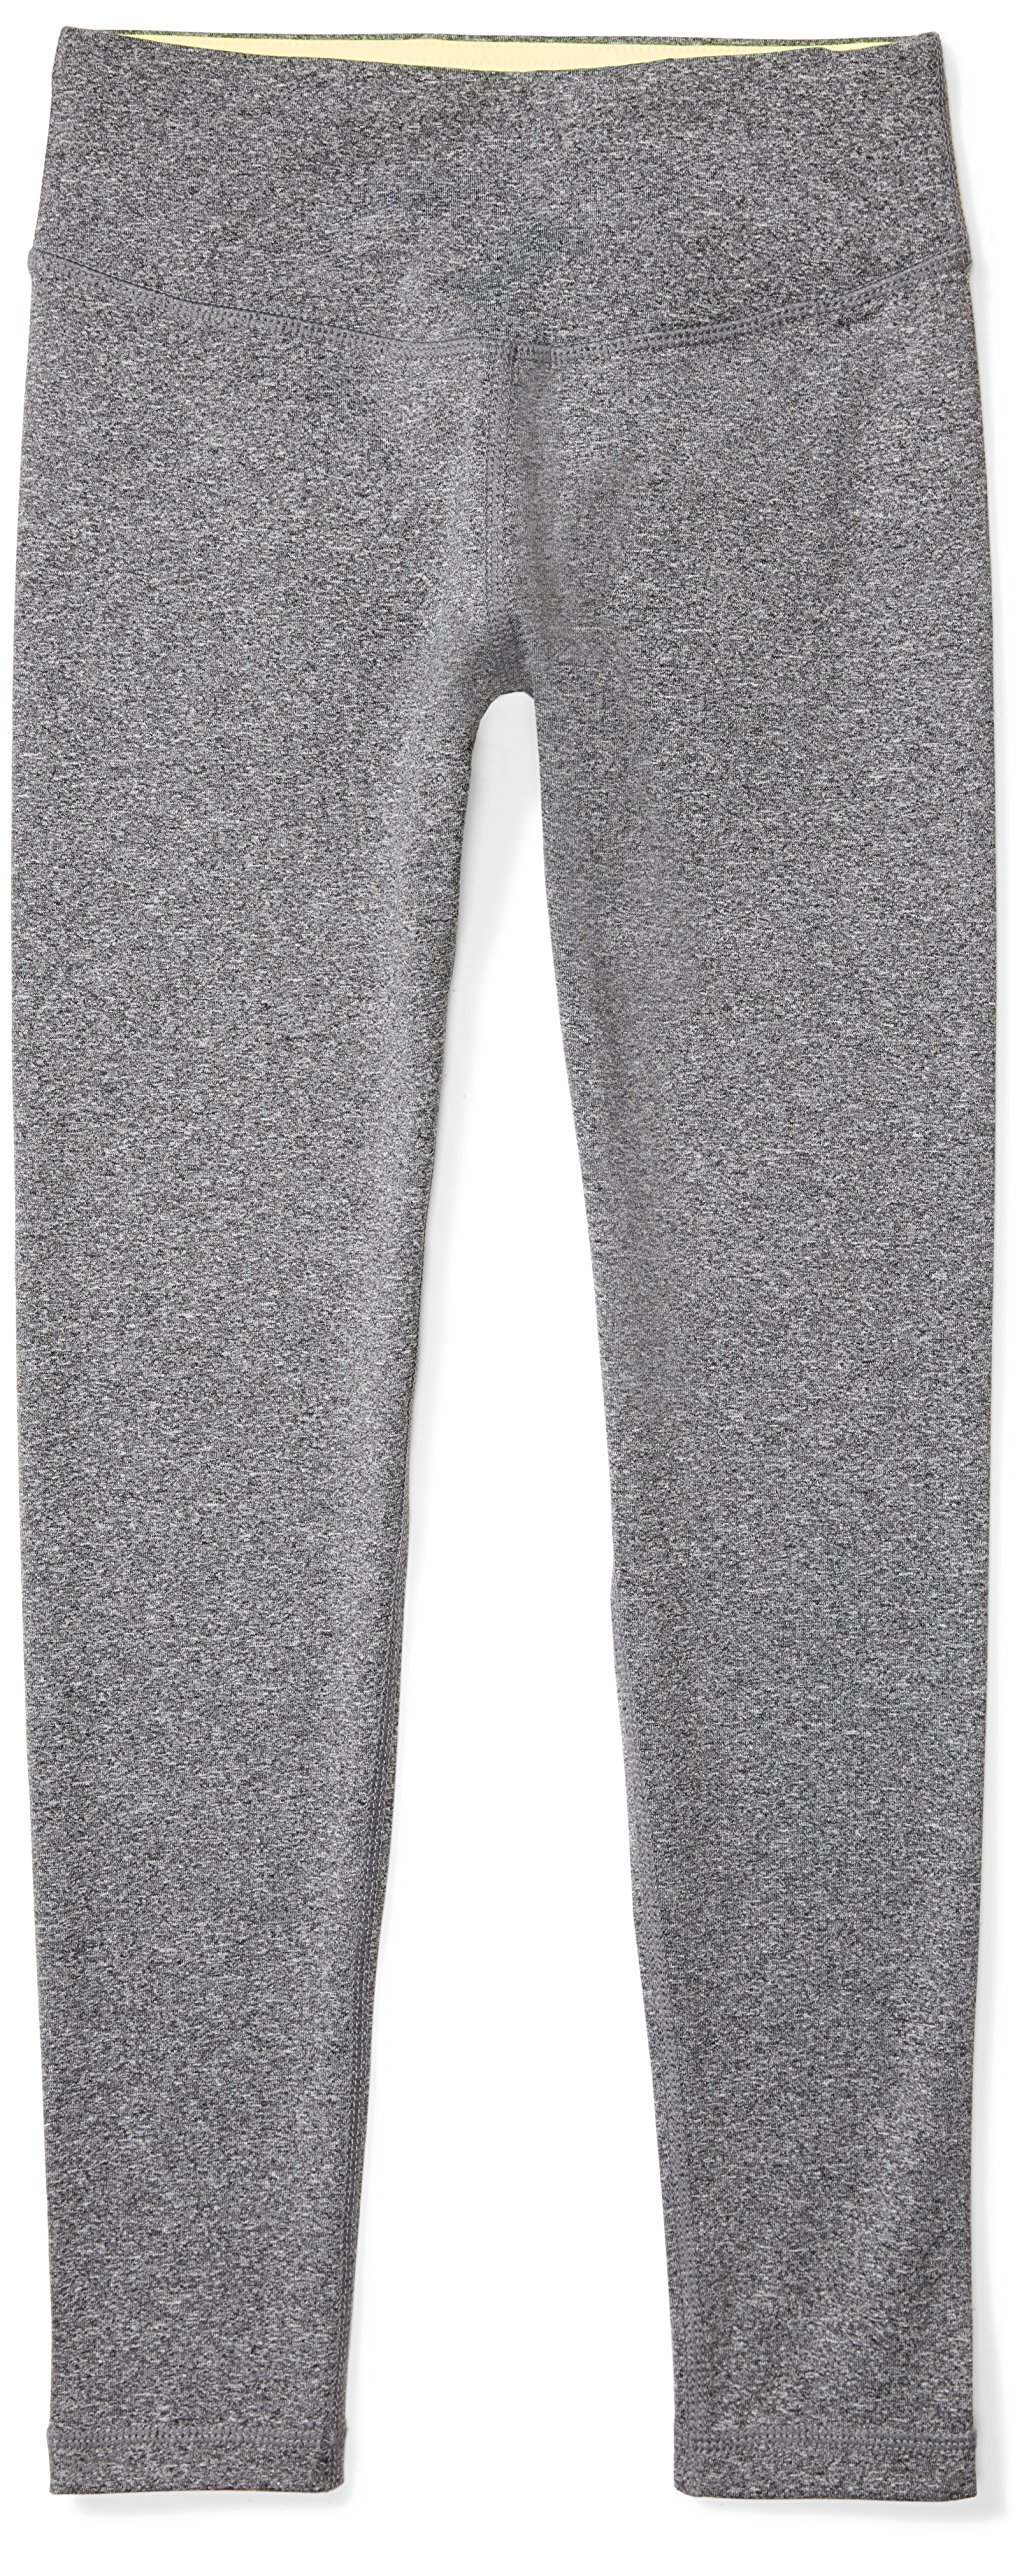 Starter Girls' 23'' Performance Workout Legging, Prime Exclusive, Carbon Grey Jaspe, M (7/8)